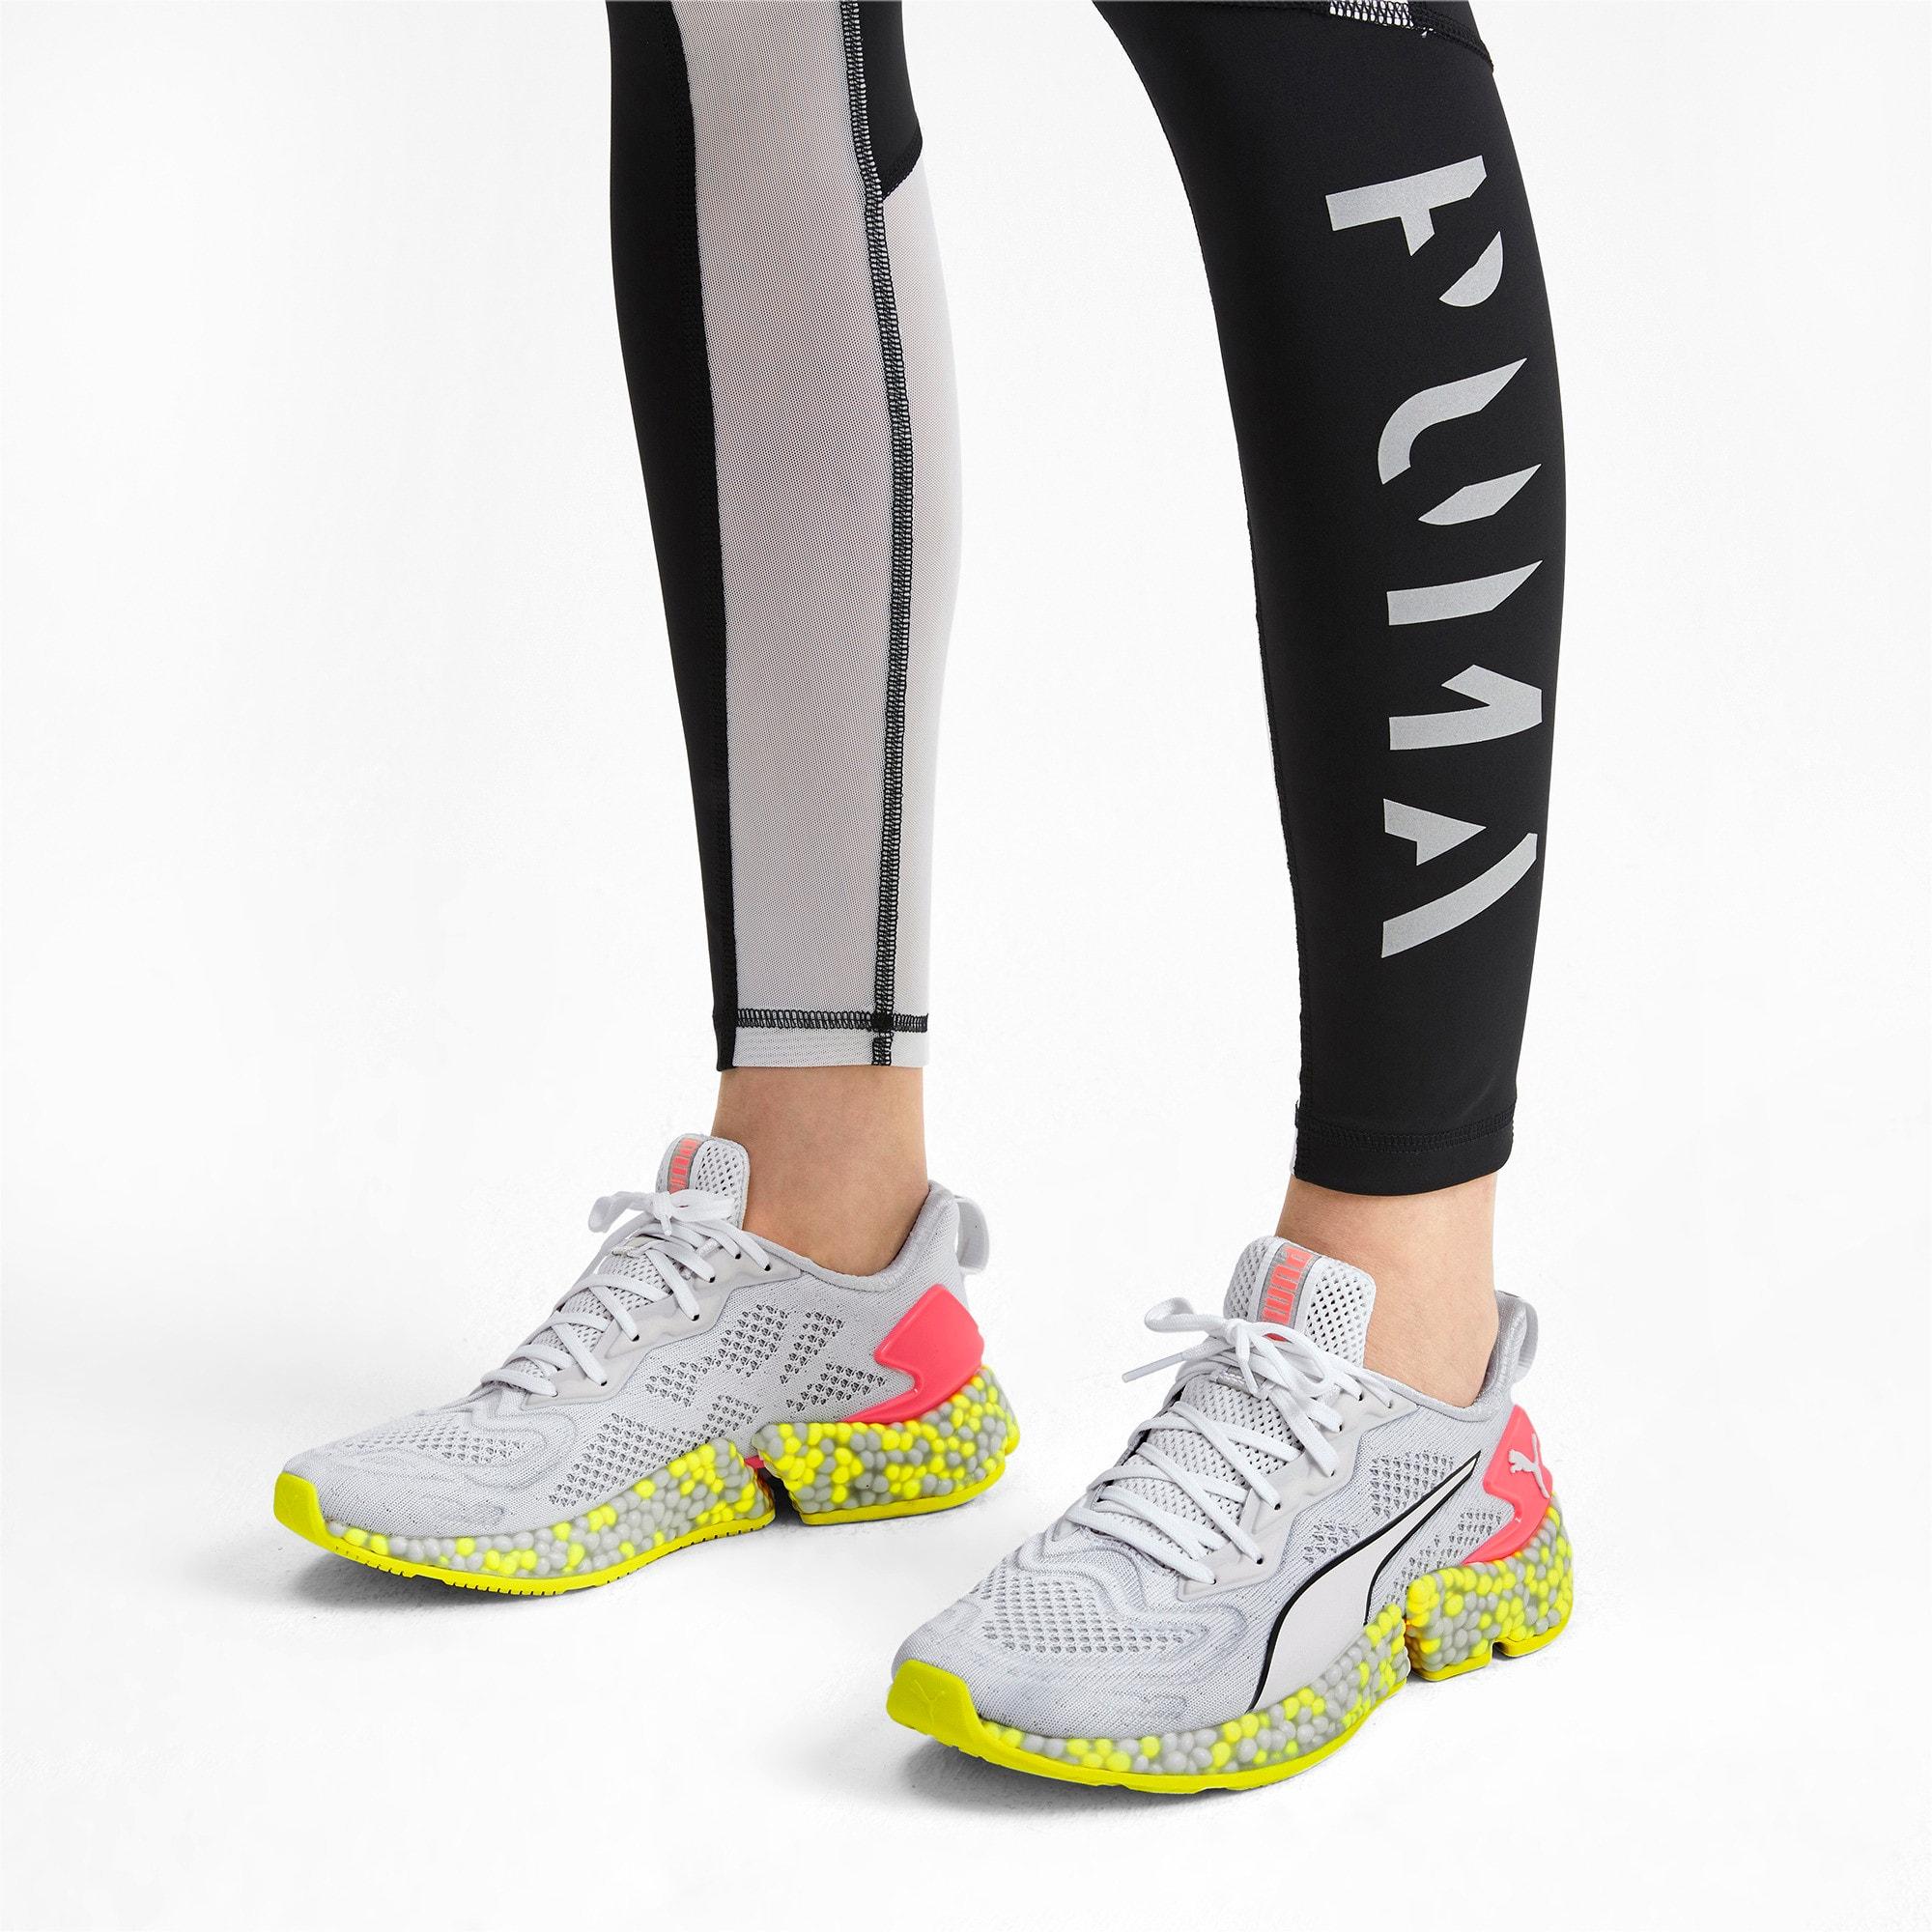 Thumbnail 2 of HYBRID SPEED Orbiter Women's Running Shoes, Puma White-Yellow Alert, medium